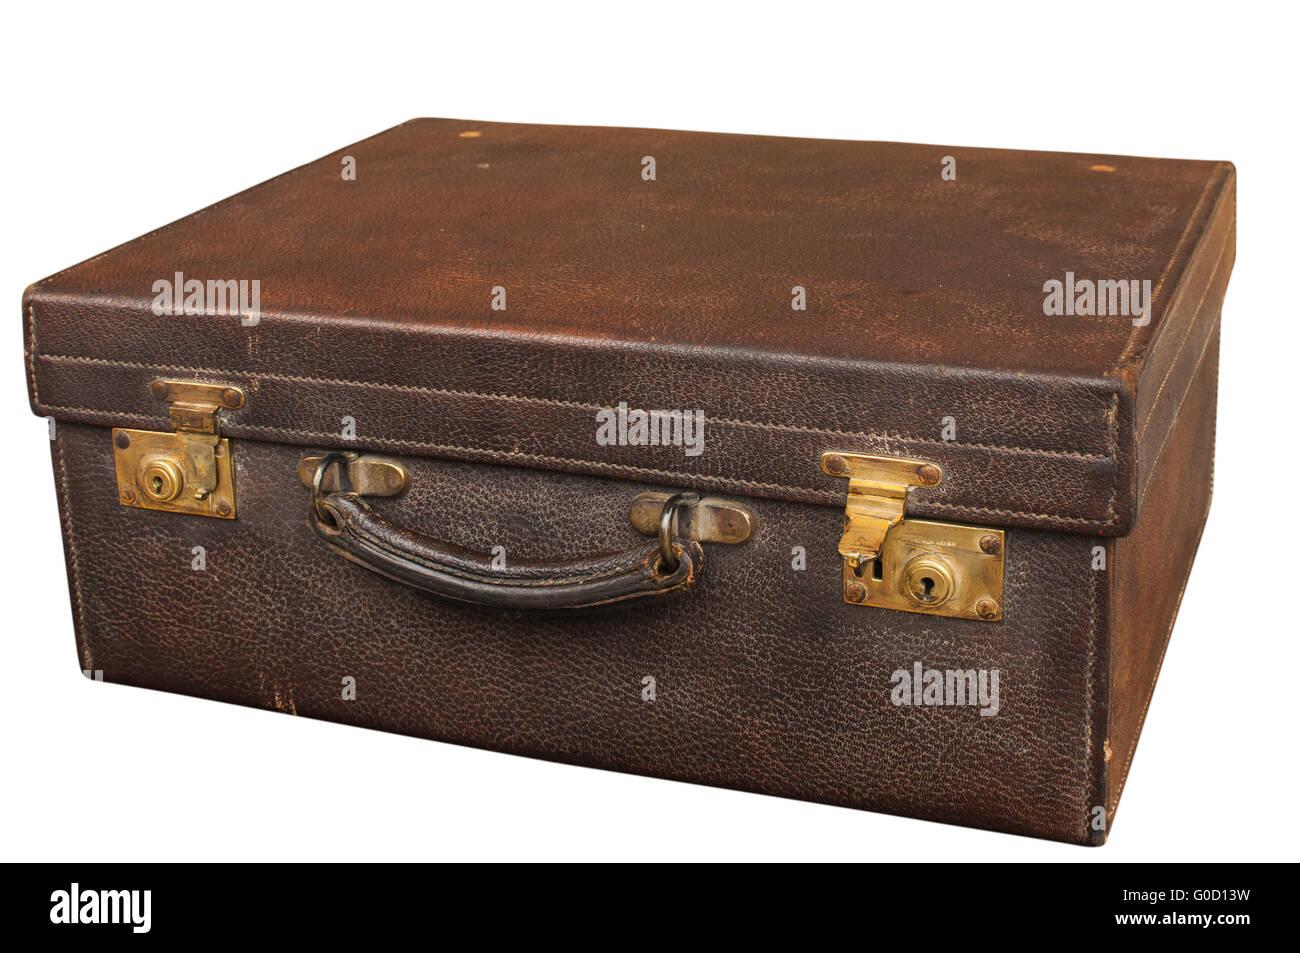 Old Closet Locked Retro Vintage Leather Suitcase   Stock Image